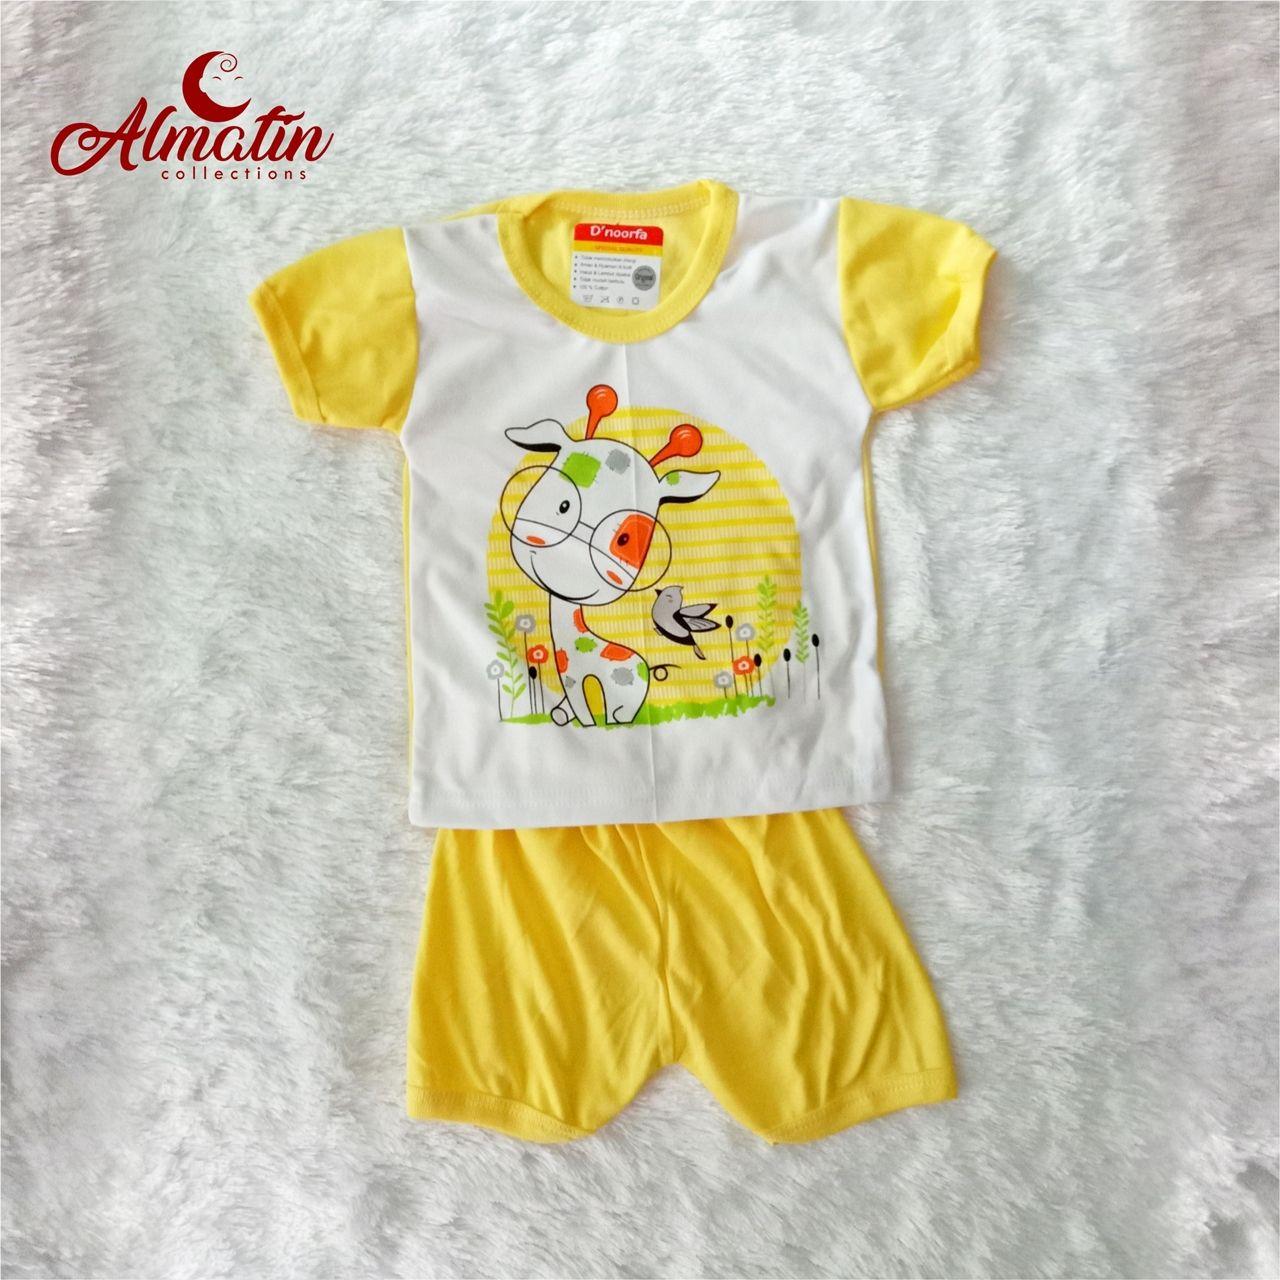 Grosir Baju Bayi Terdekat